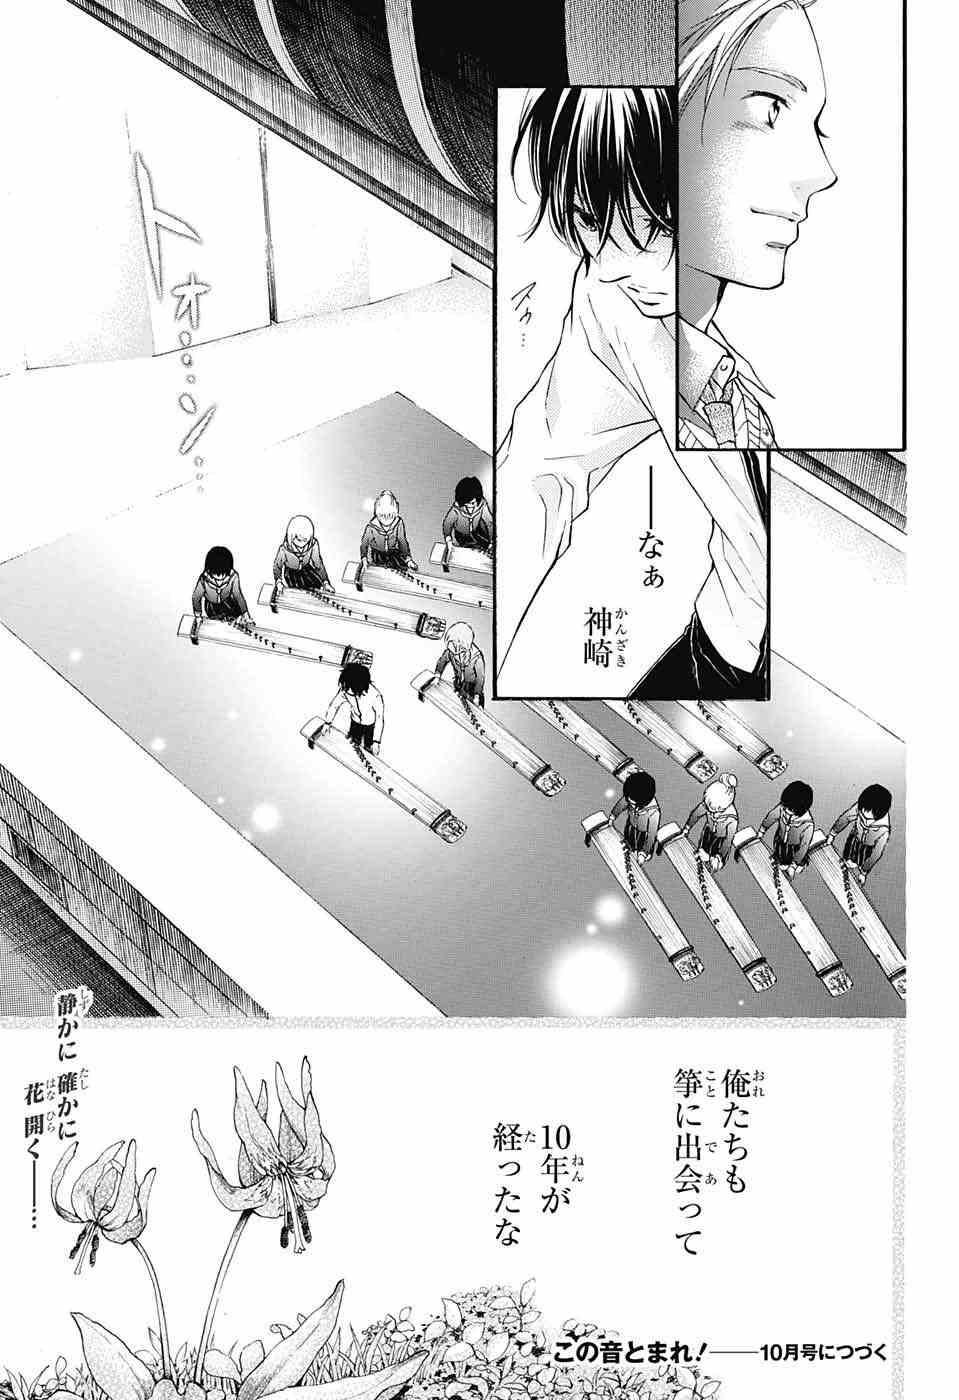 Kono Oto Tomare! - Chapter 49 - Page 45